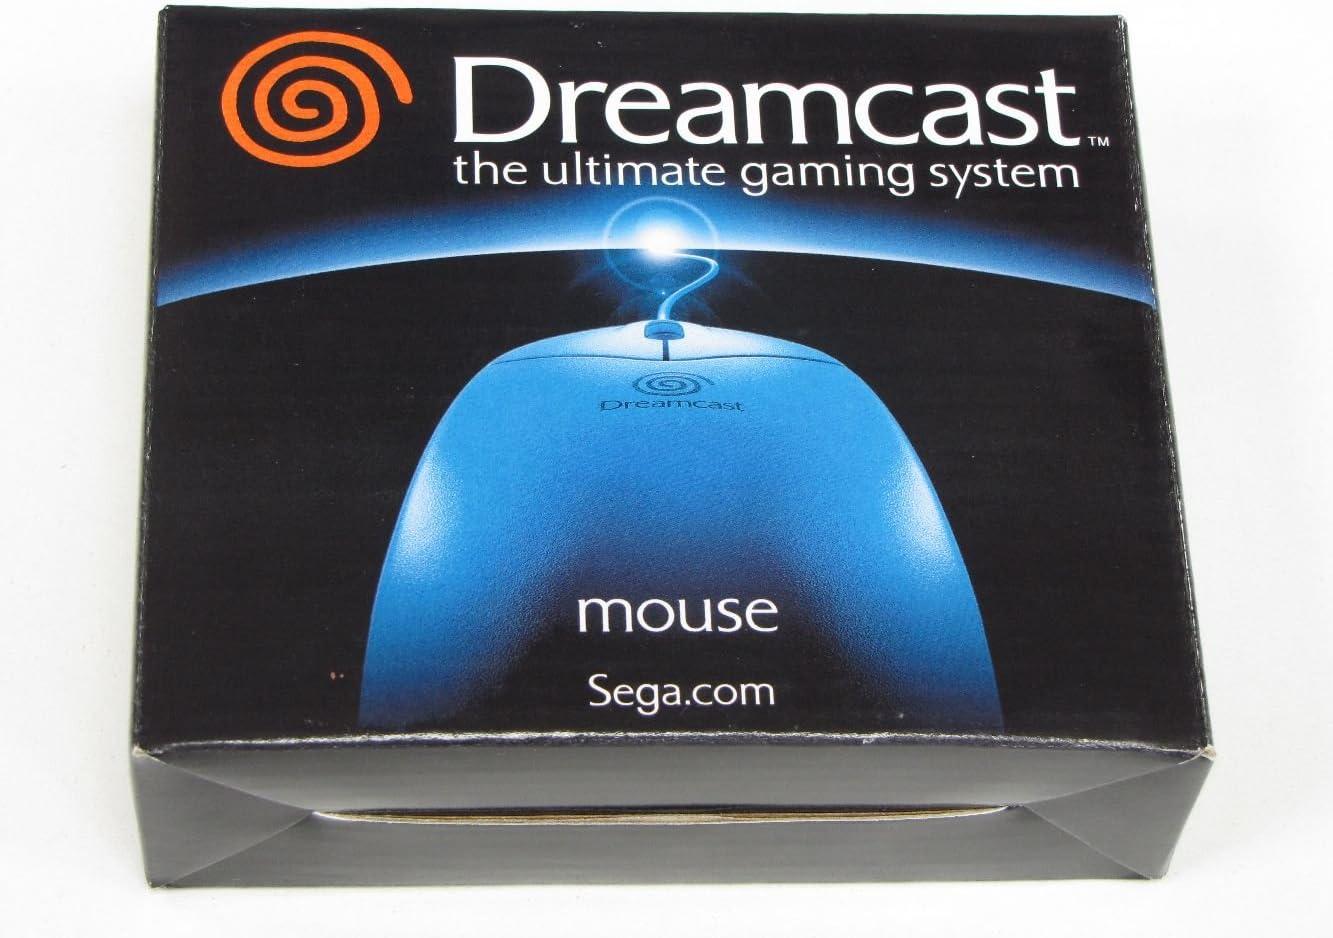 Sega Dreamcast Mouse - Ratón: Amazon.es: Videojuegos